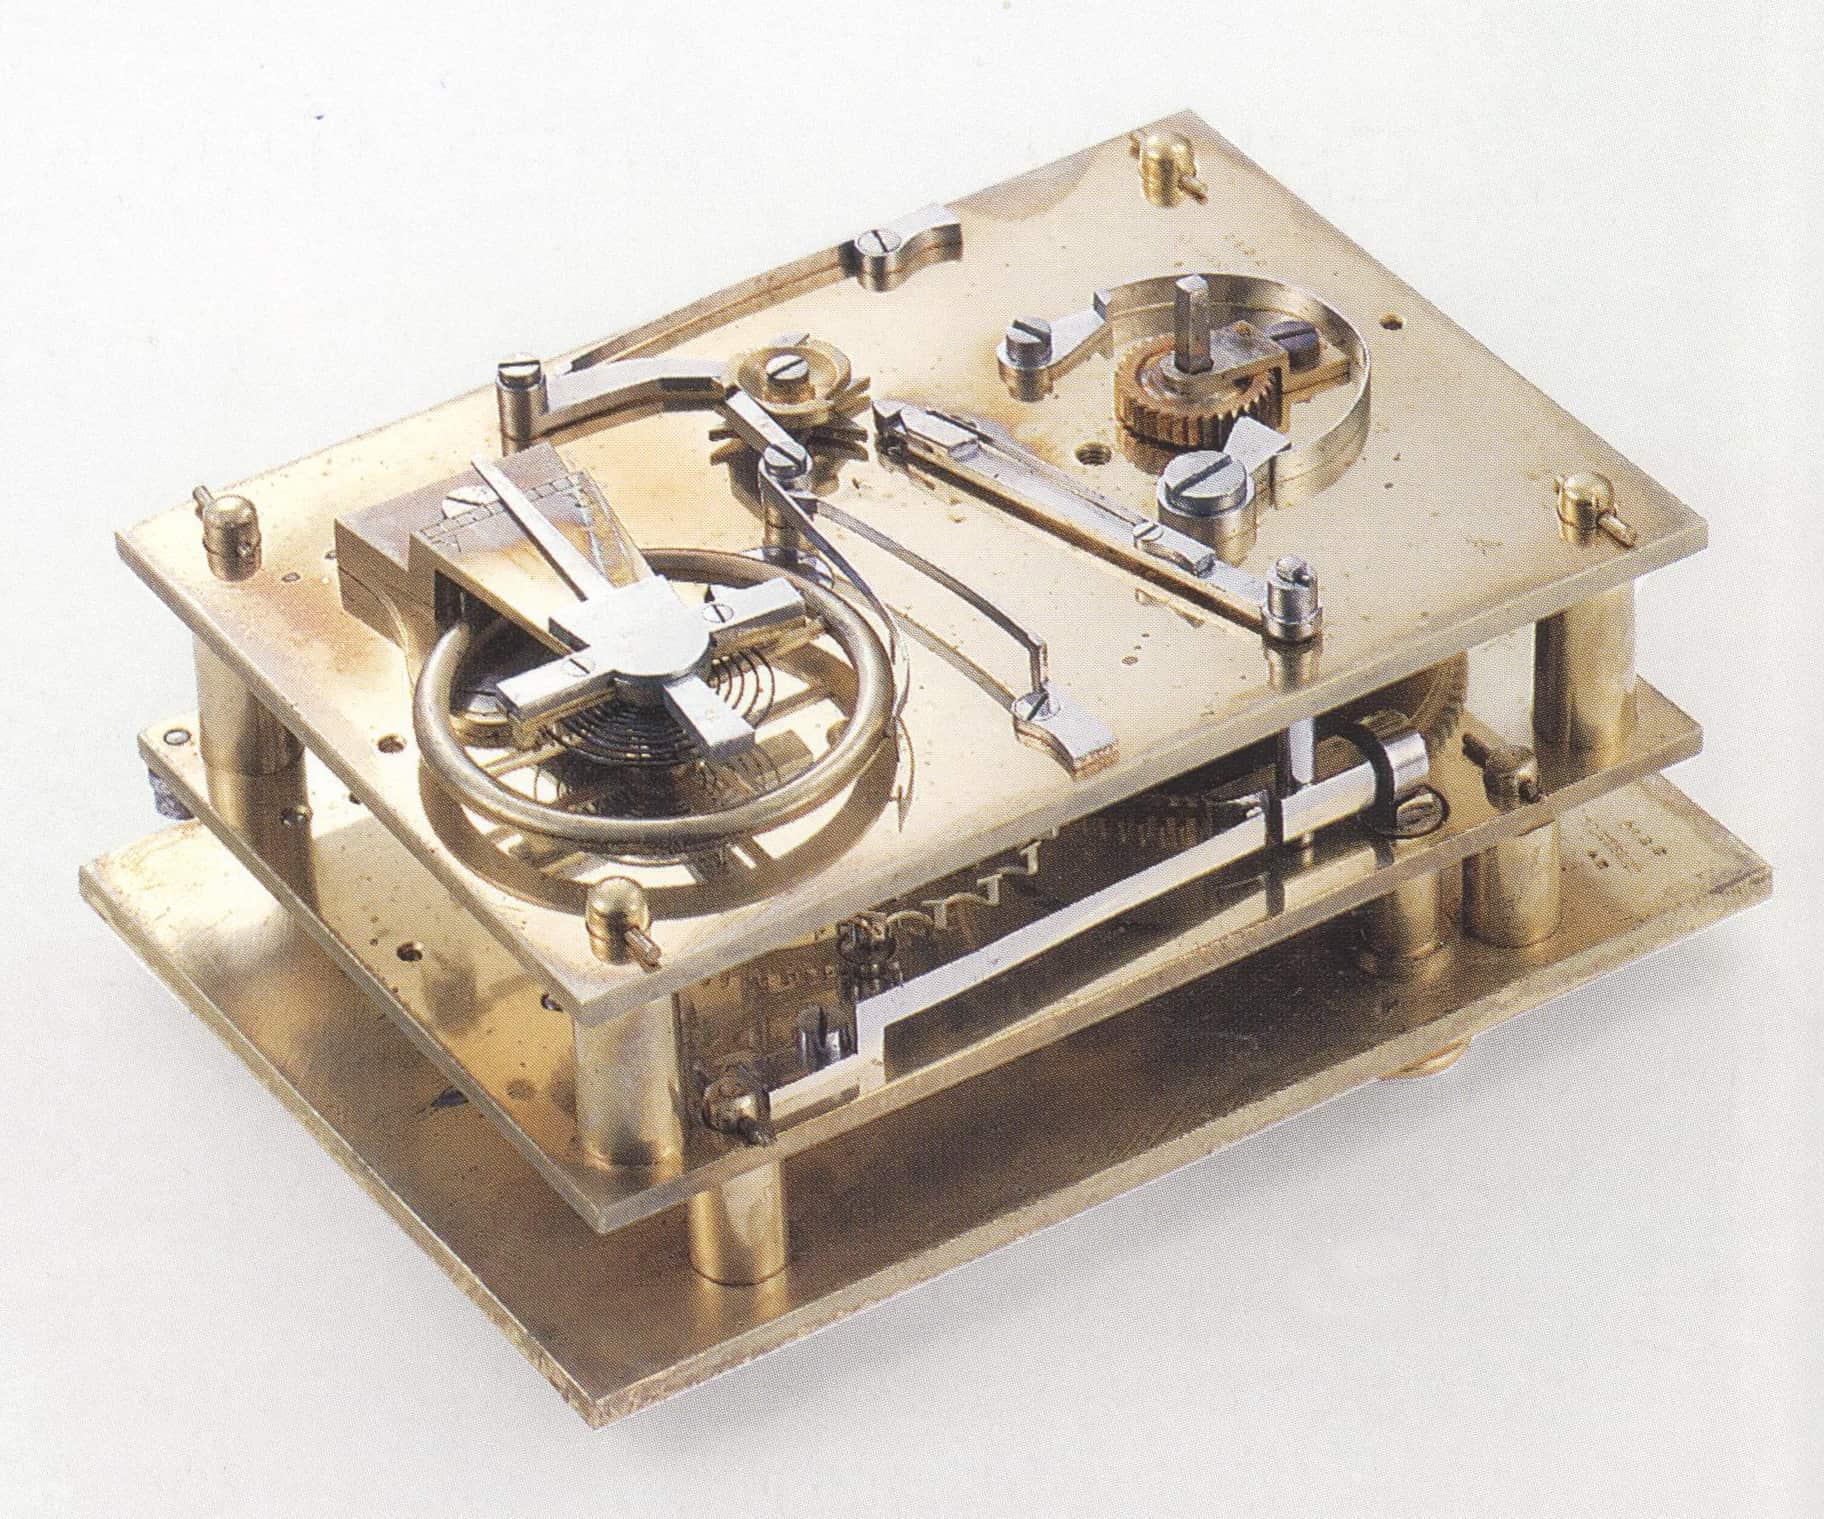 Tintenschreiber Chronograph von Nicolas Mathieu Rieussec